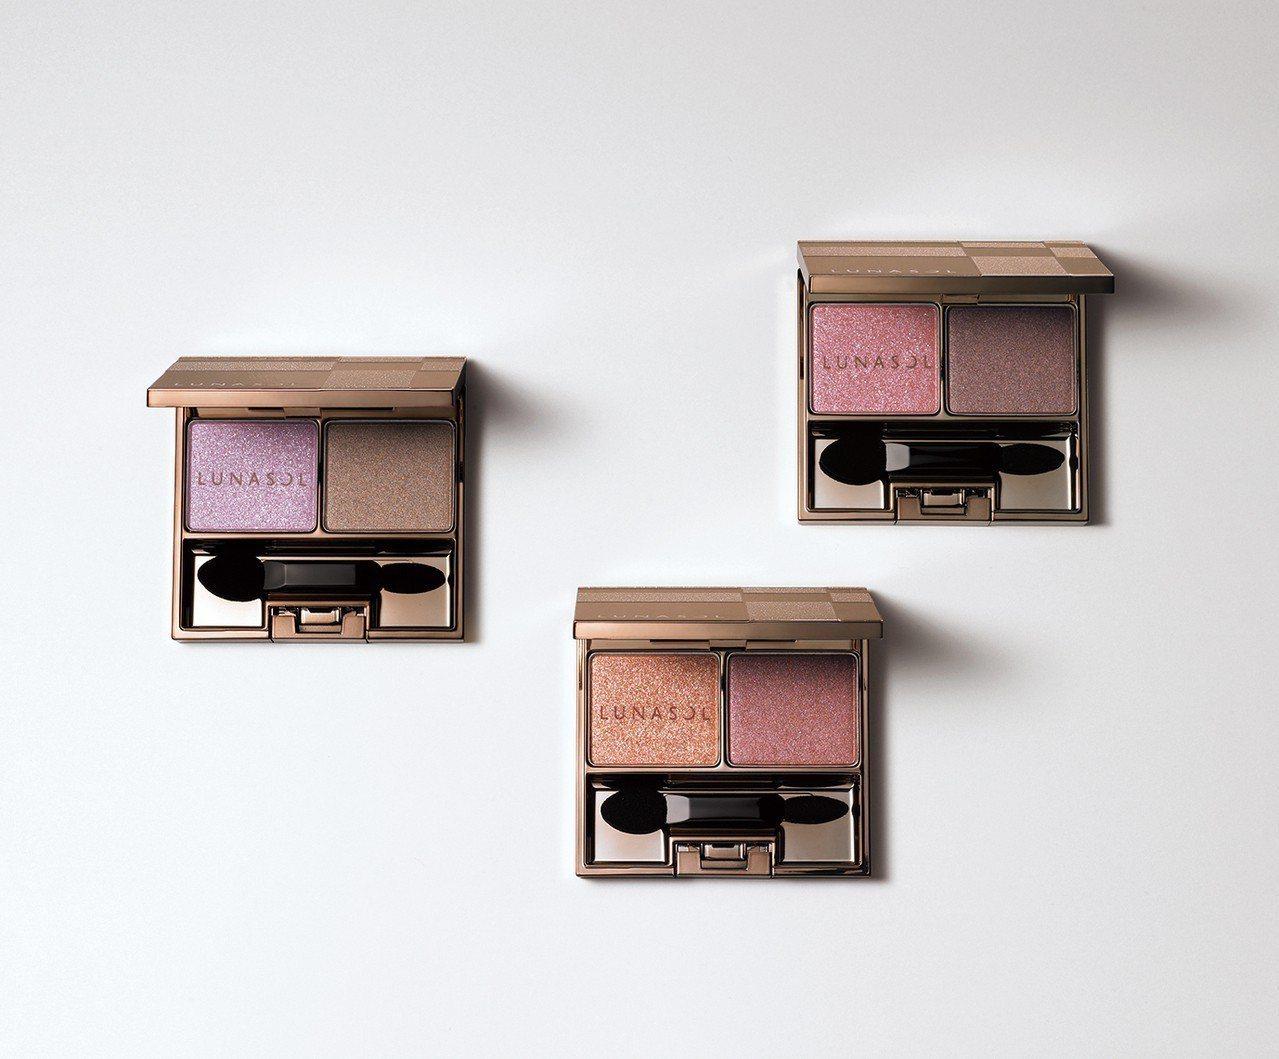 LUNASOL雙彩眼盒3款各1,500元。圖/佳麗寶提供